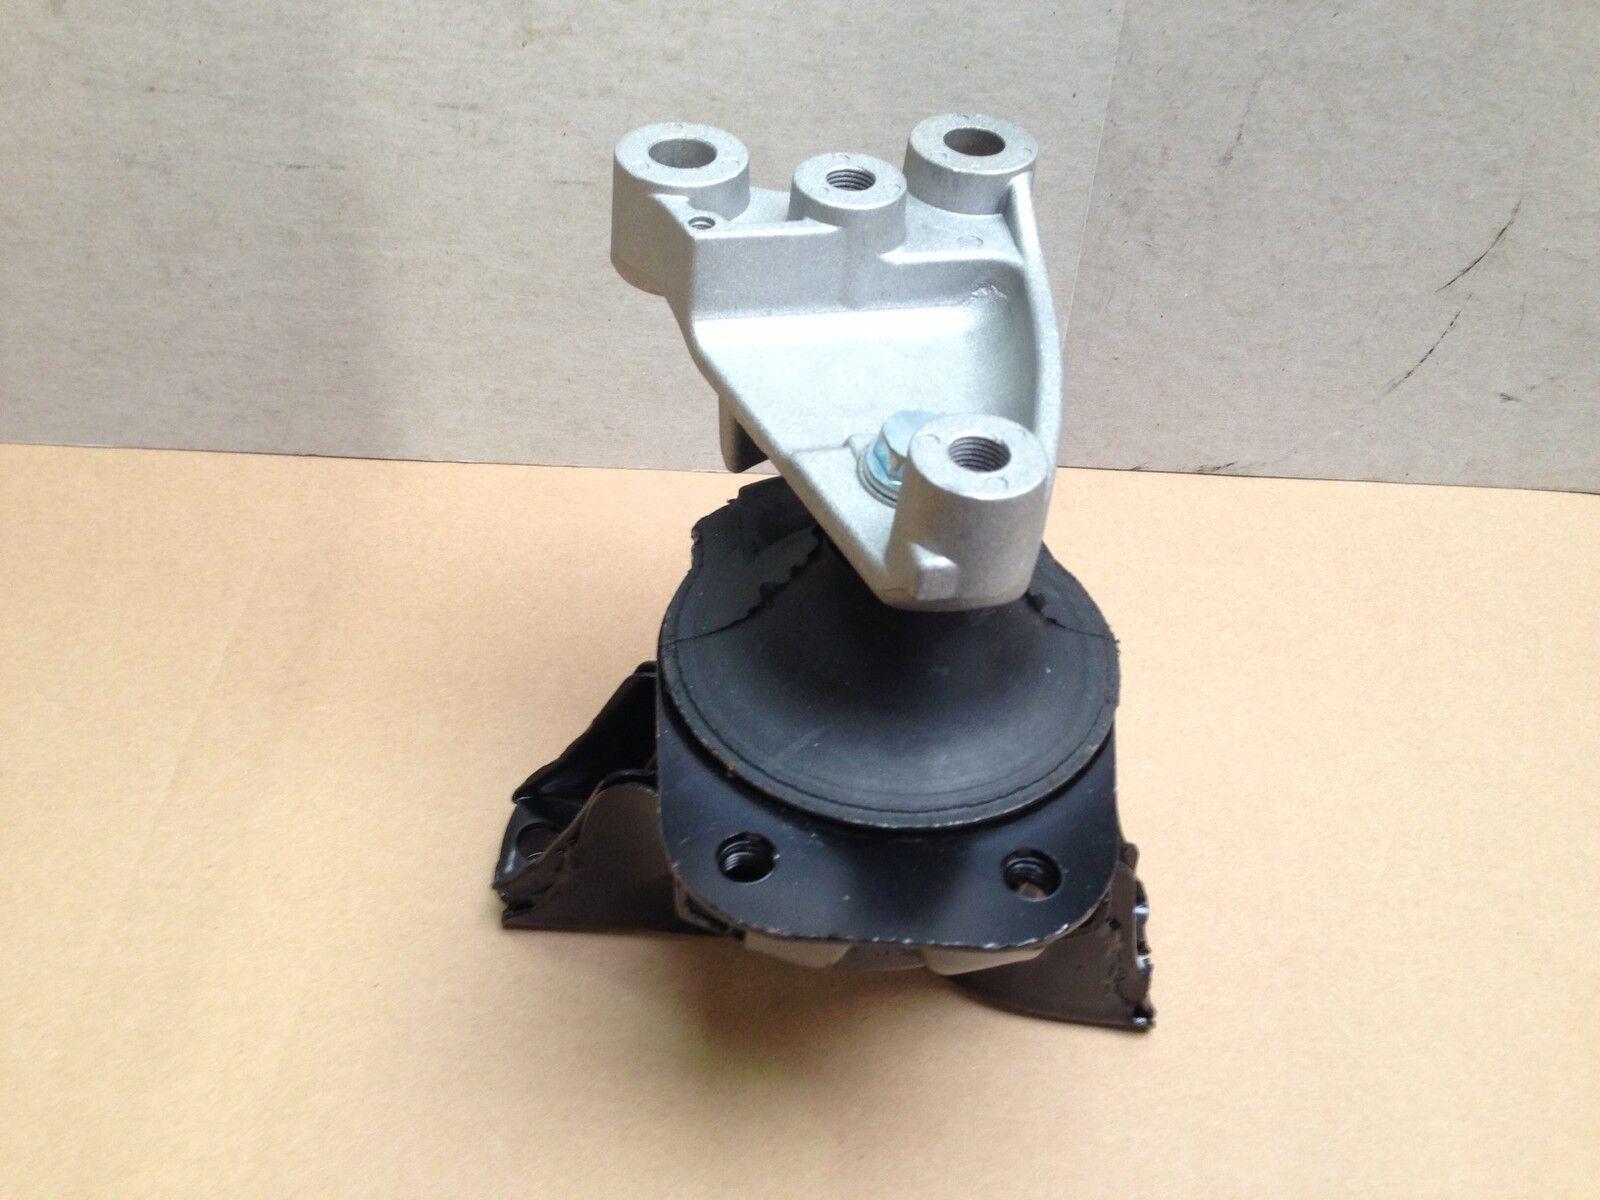 New Engine Motor Mount For NISSAN SENTRA 2.0L 4PCS Trans w/ AT Set M239 Automotive